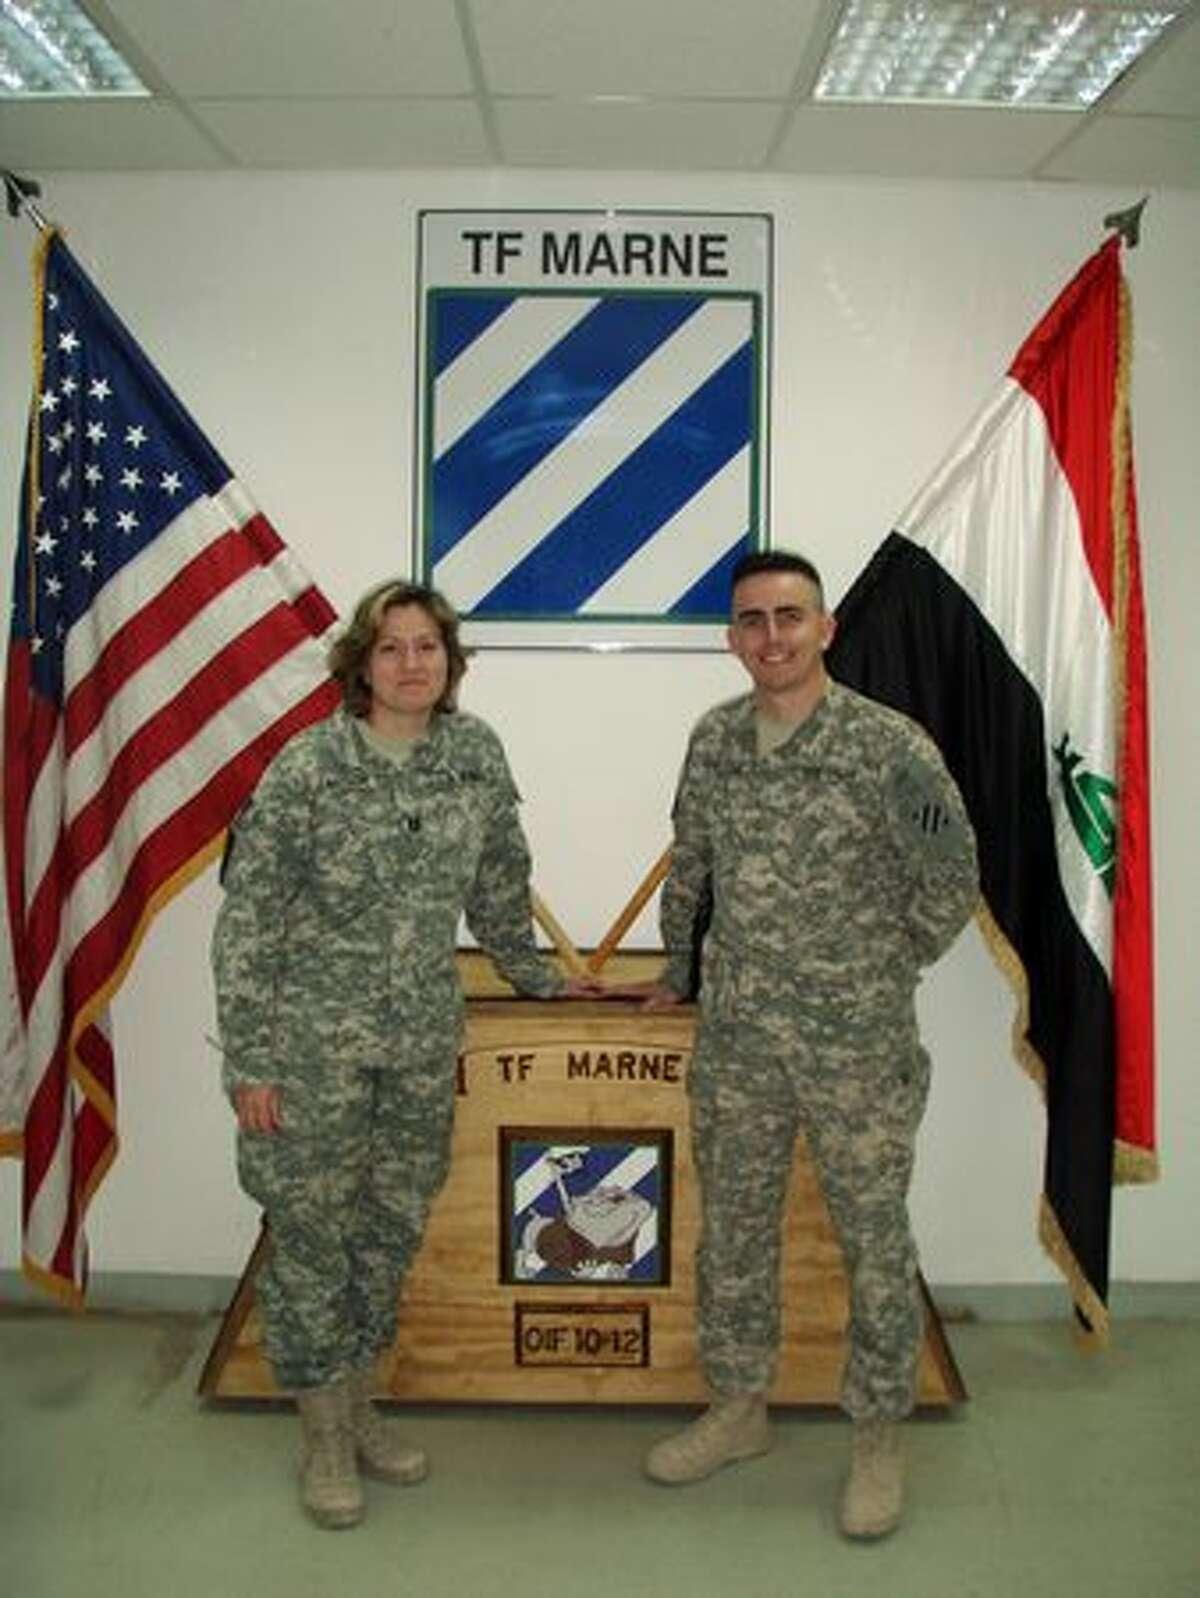 Captain Brandy Fargon and Major Patrick Malone.